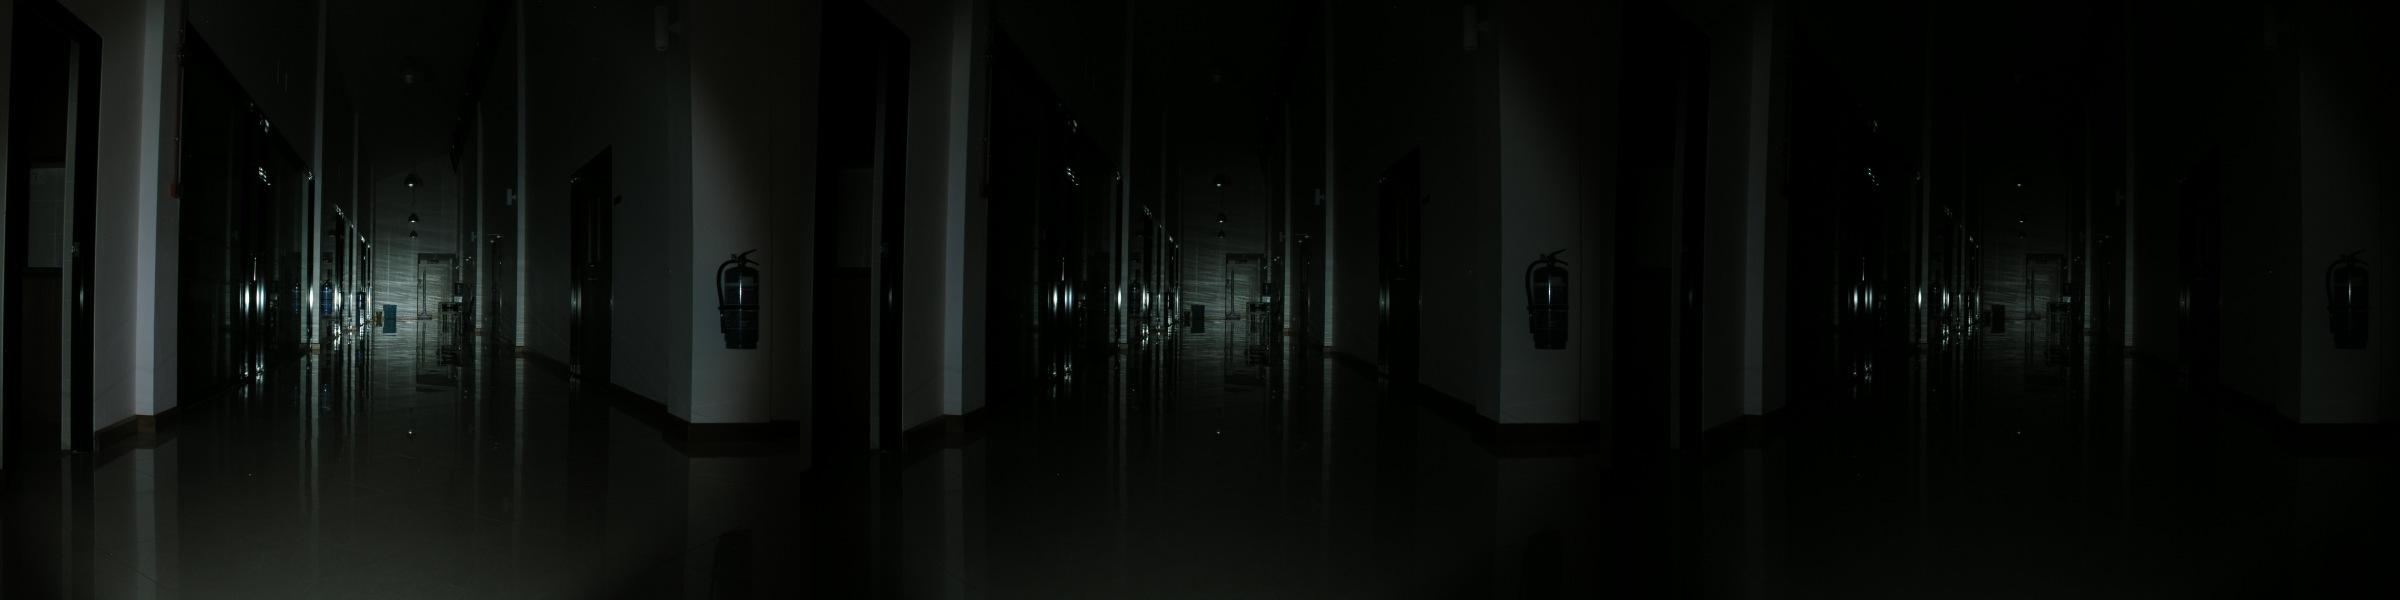 Corridor-McLuxIII PD UX1K 500mA High.jpg